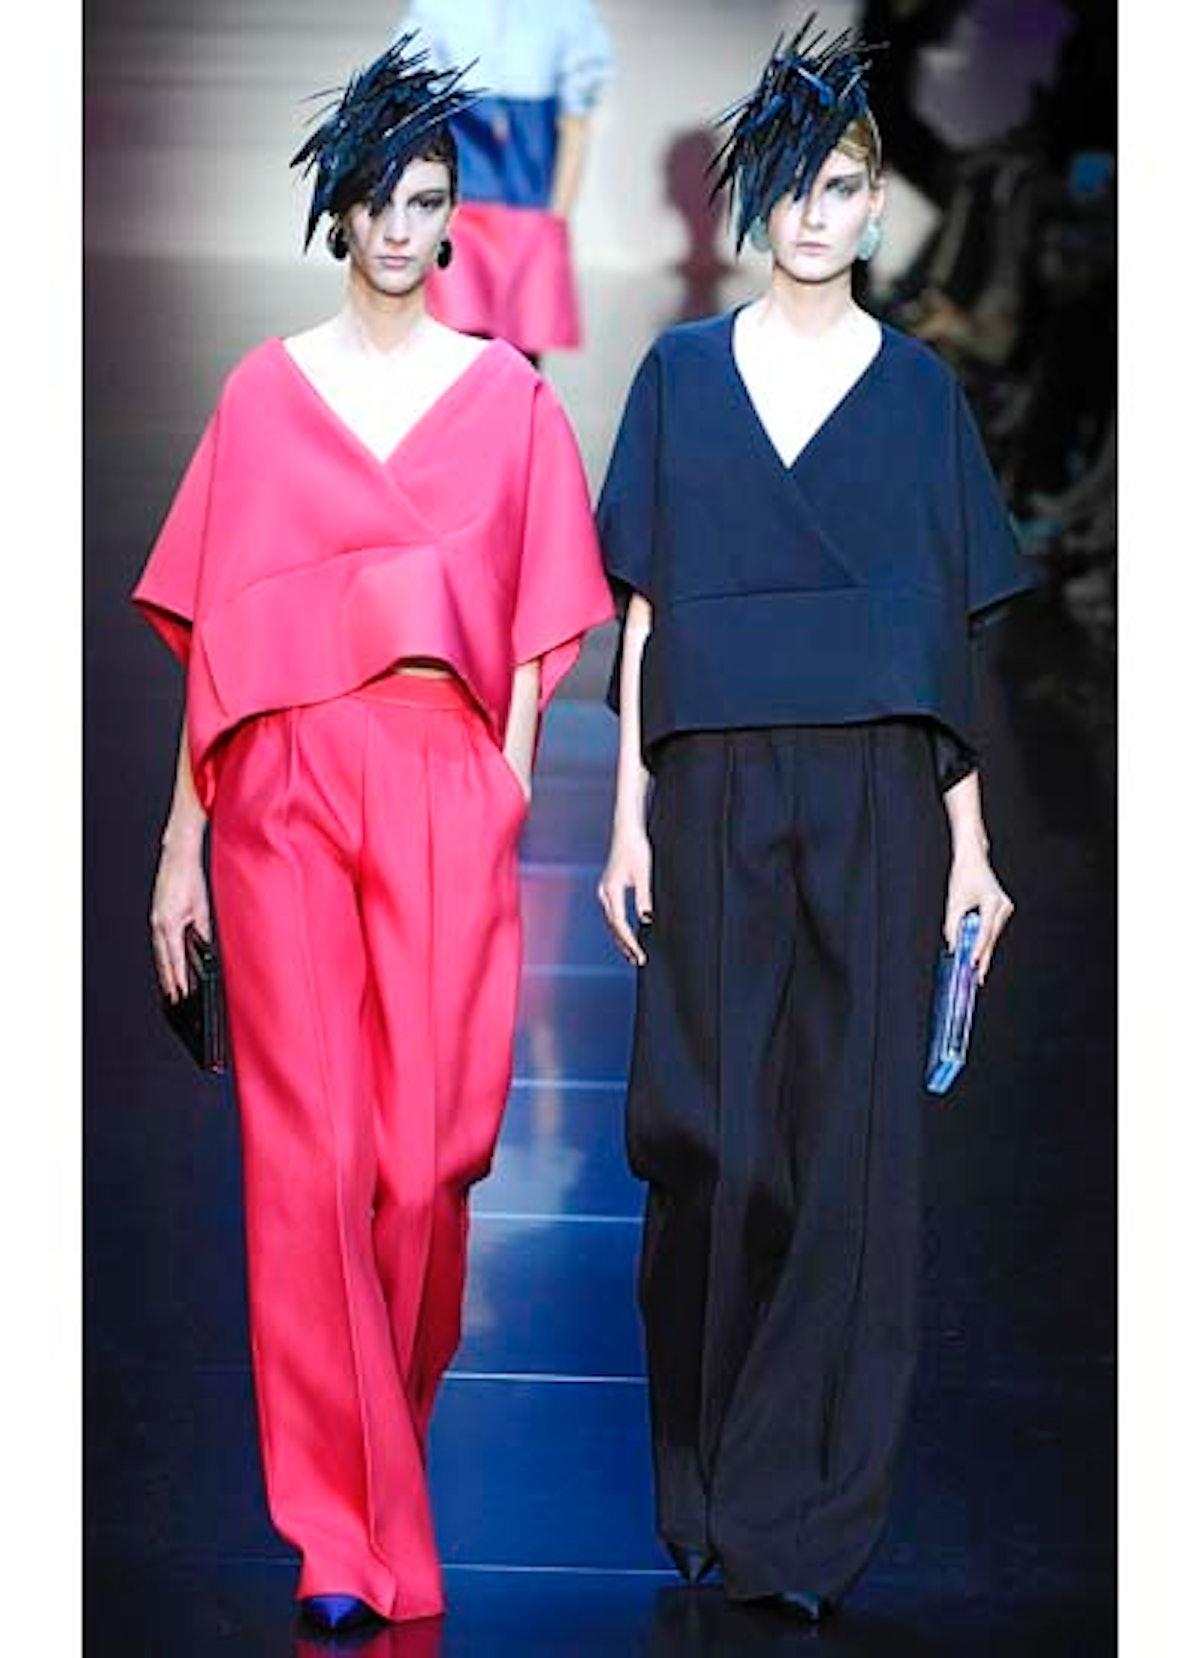 fass-giorgio-armani-couture-2012-runway-25-v.jpg